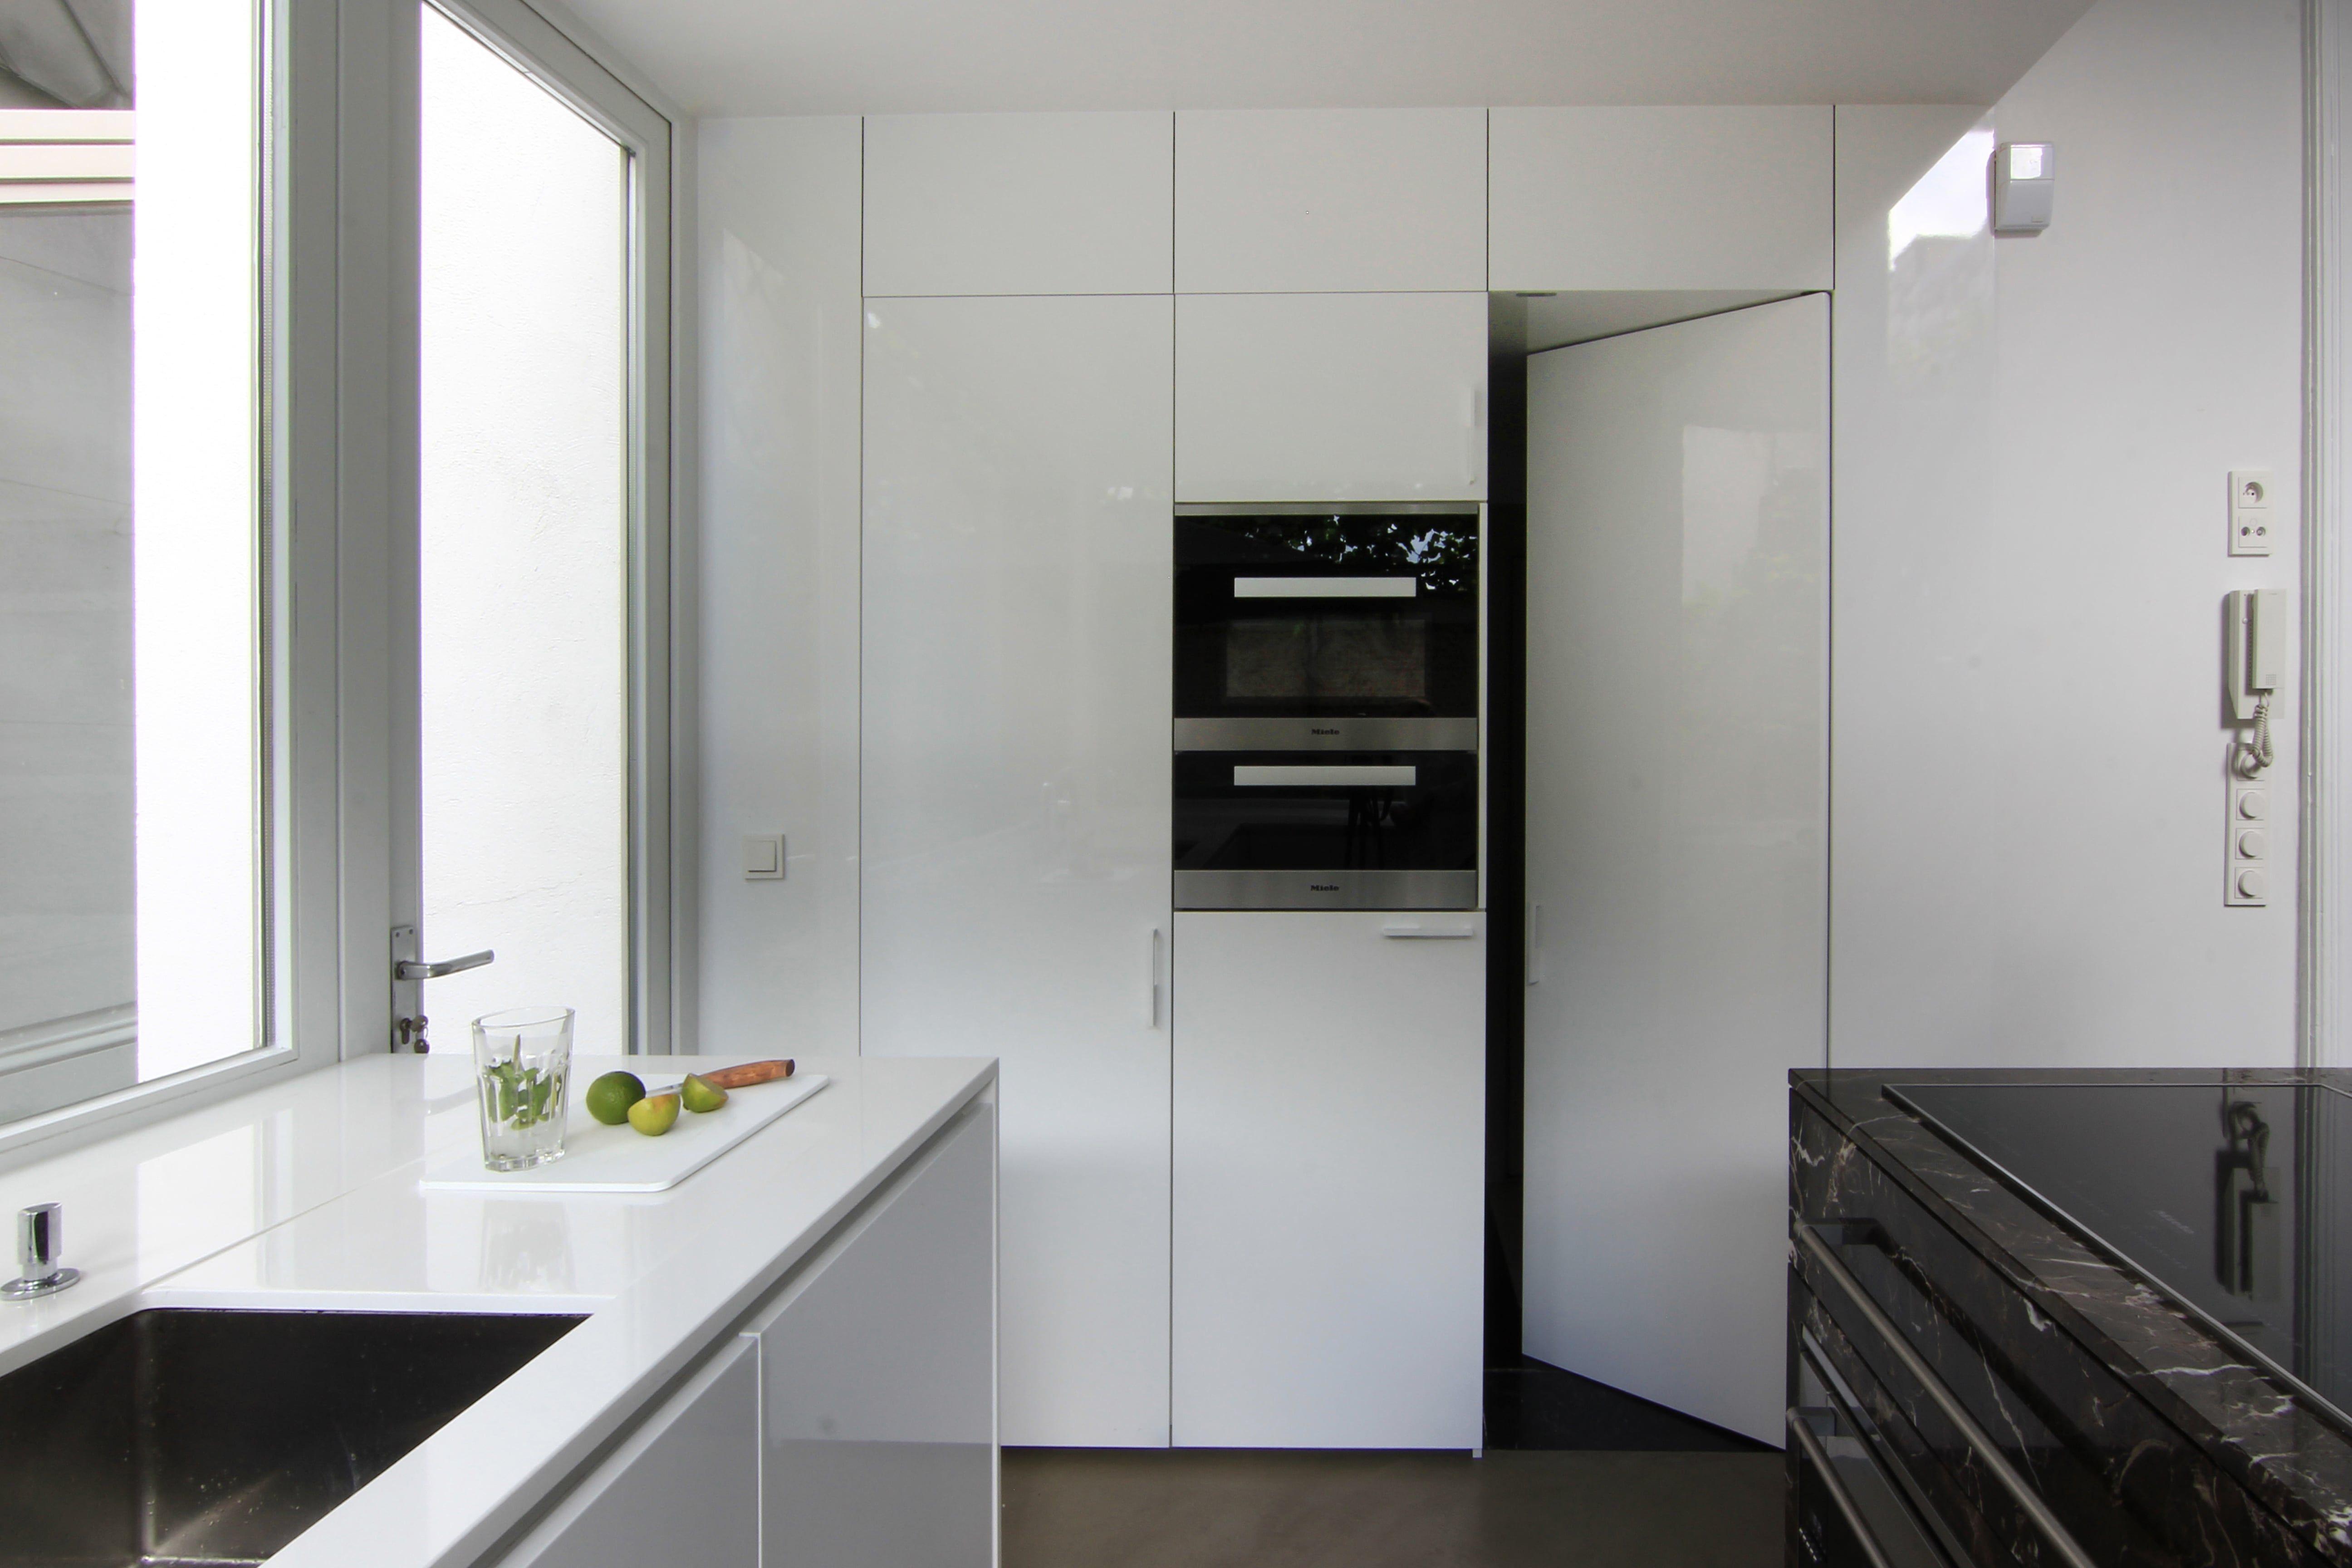 kitchen t designed by julie2 on t kitchen layout id=54910